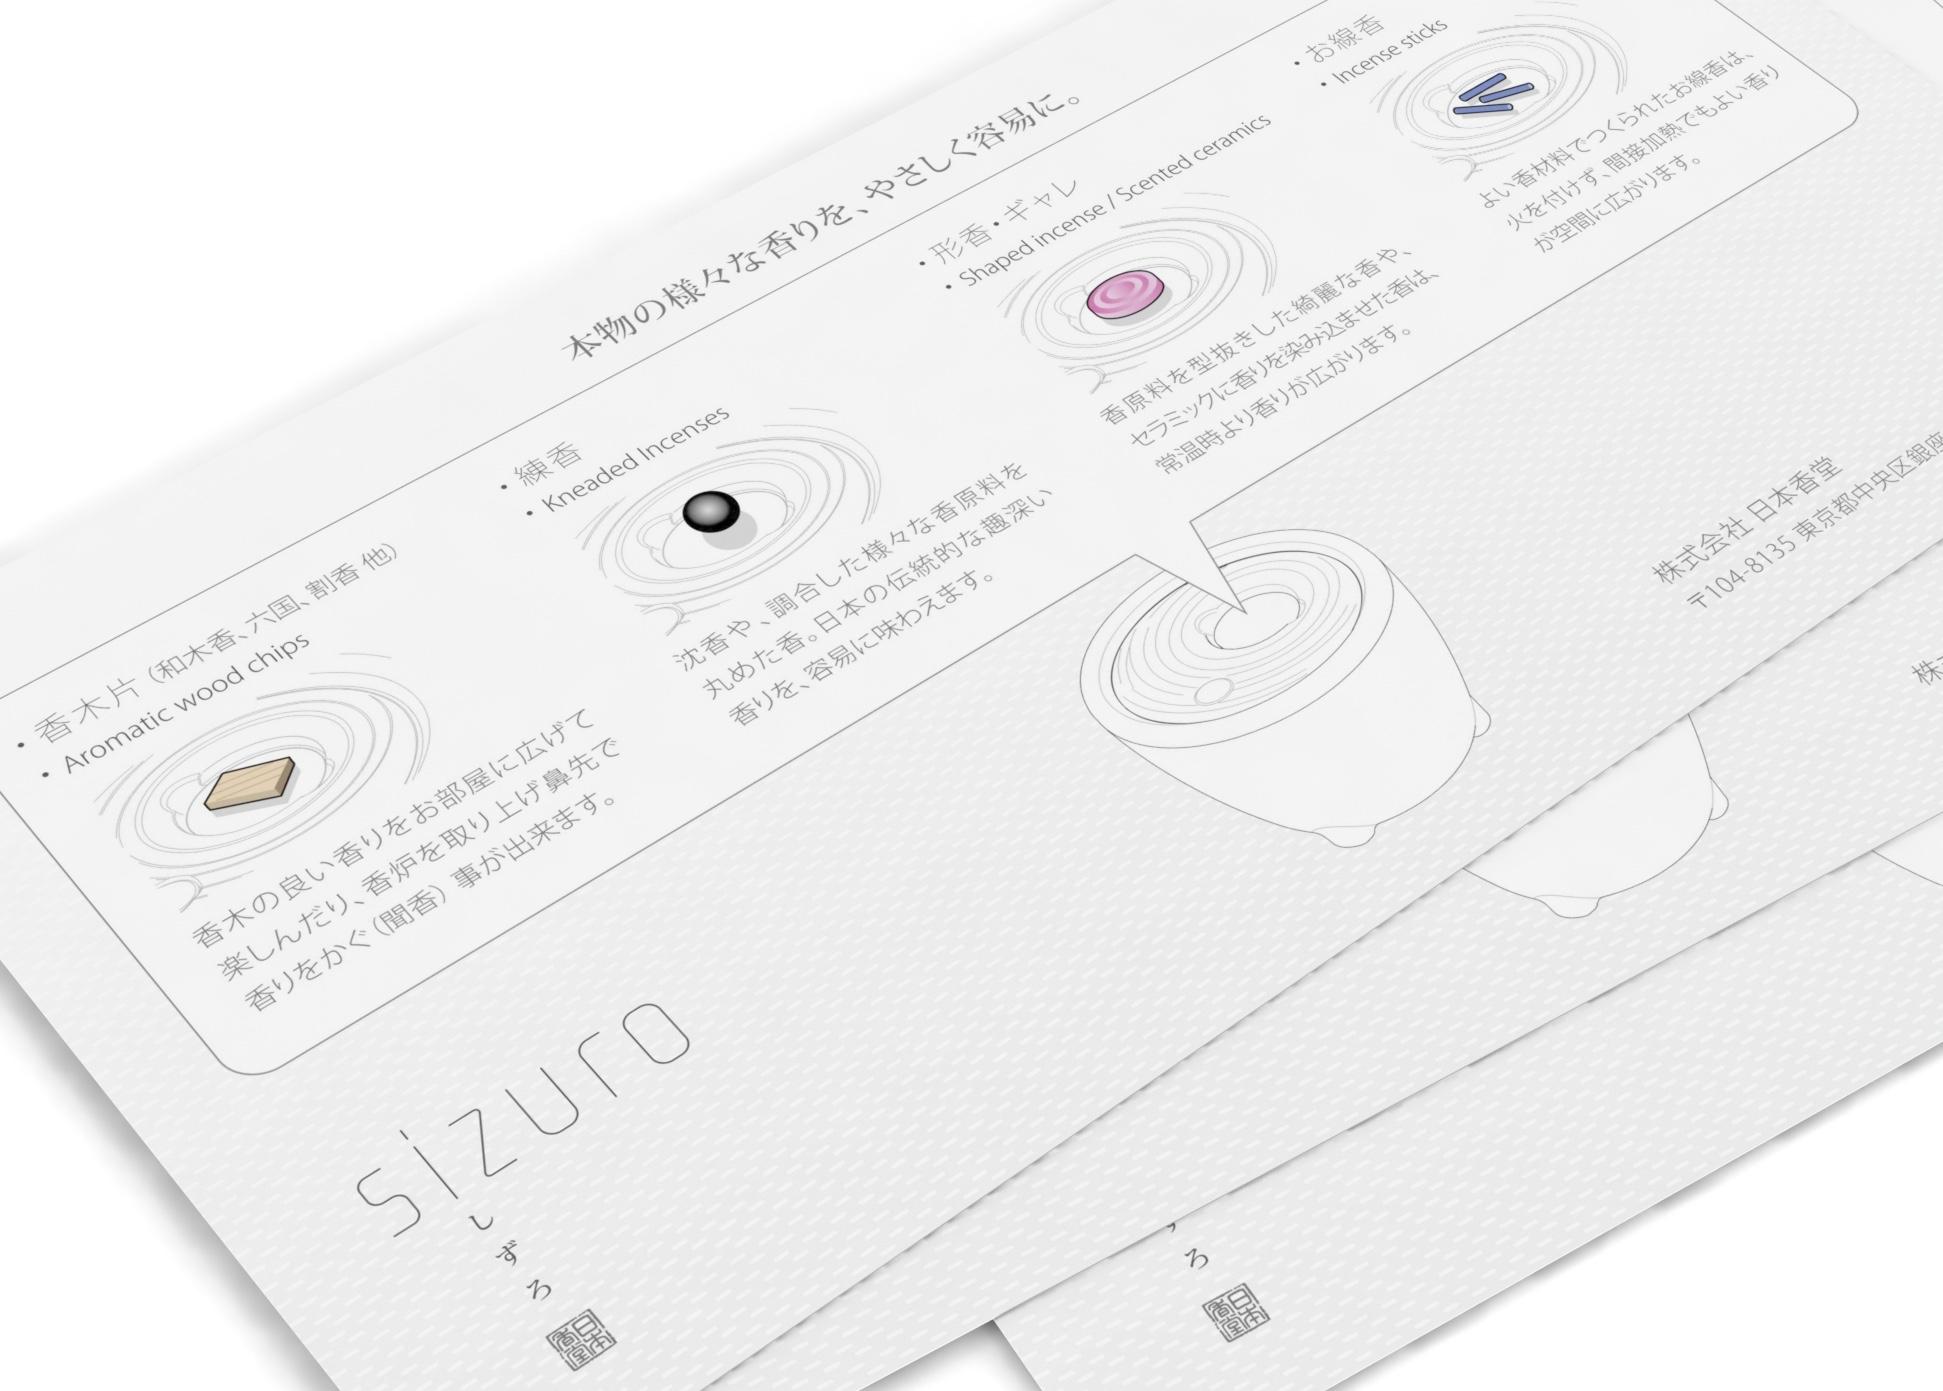 sizuro_card-02-adress_CG-0-trim-FULL-2